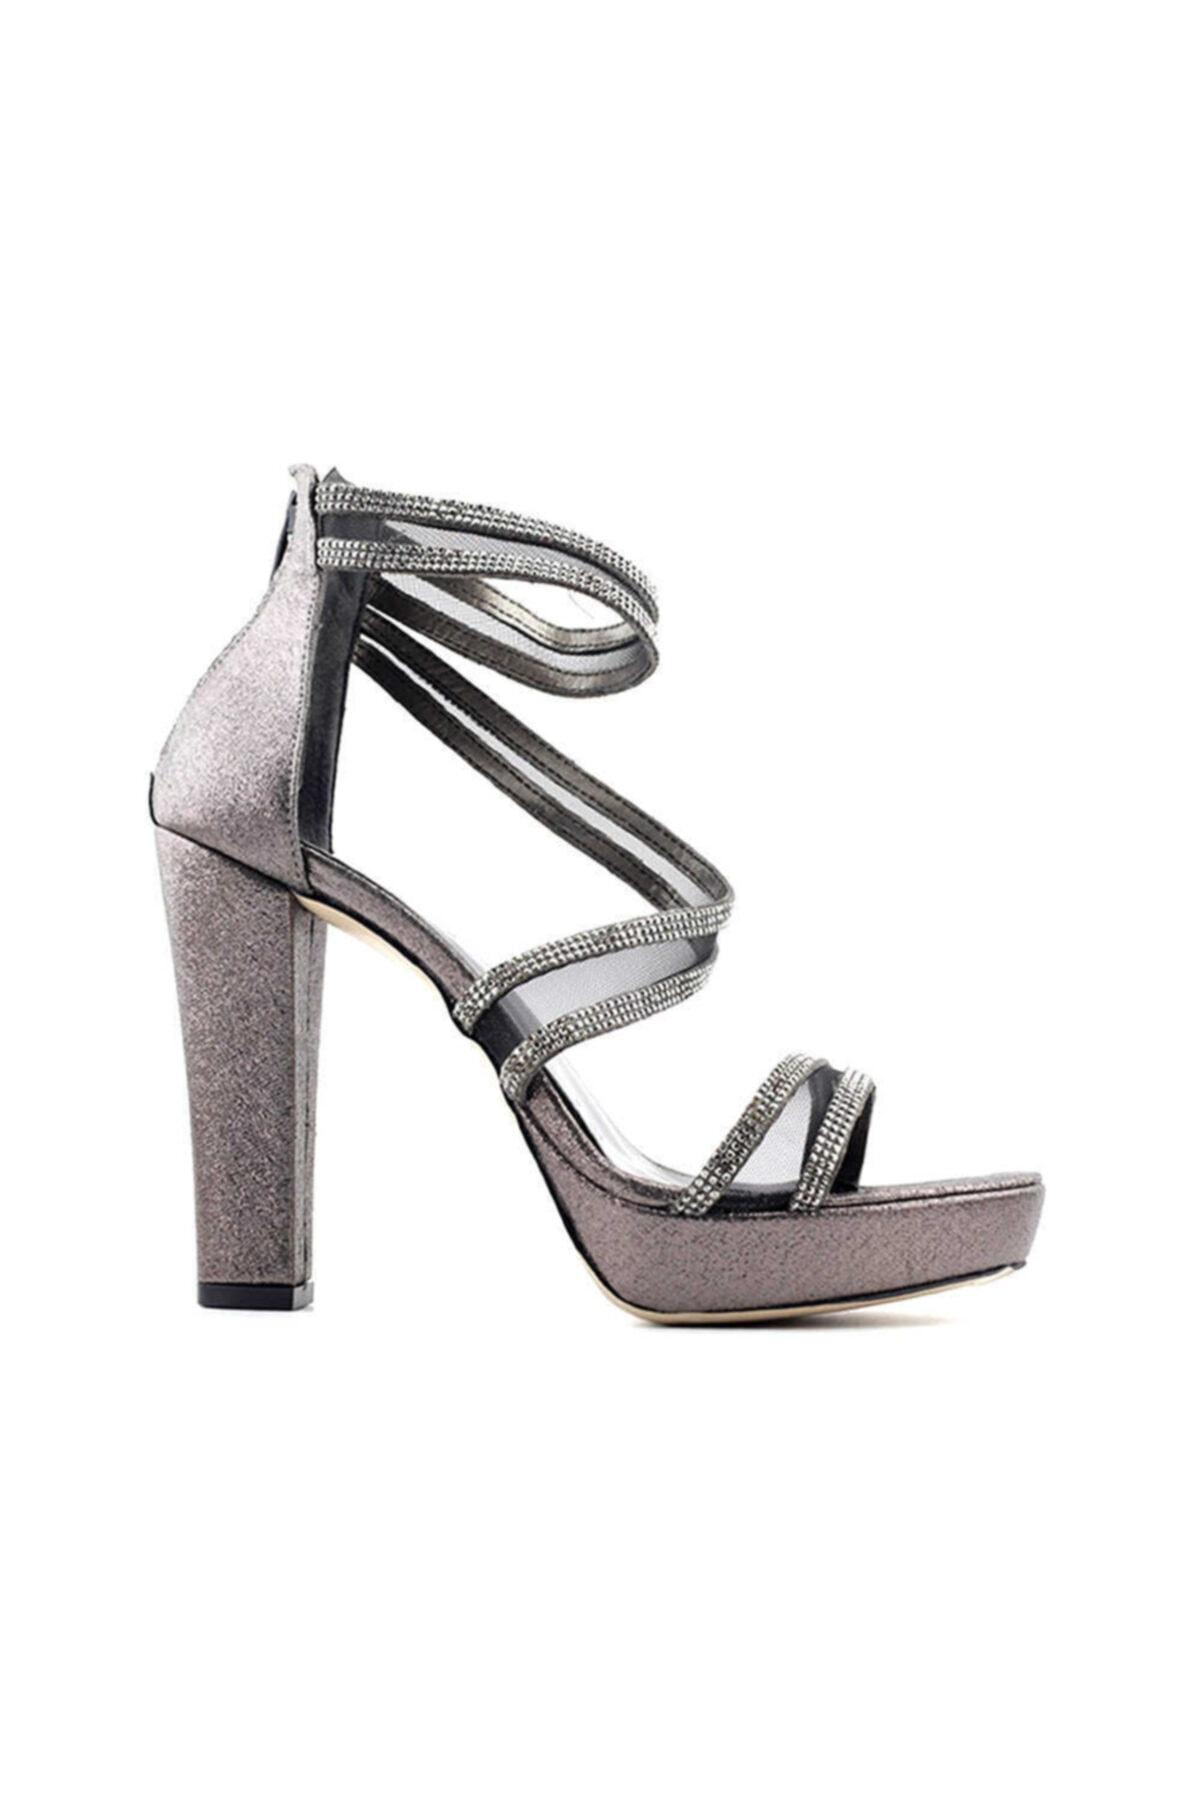 PUNTO 655102 Kadın Topuklu Ayakkabı-platin 1